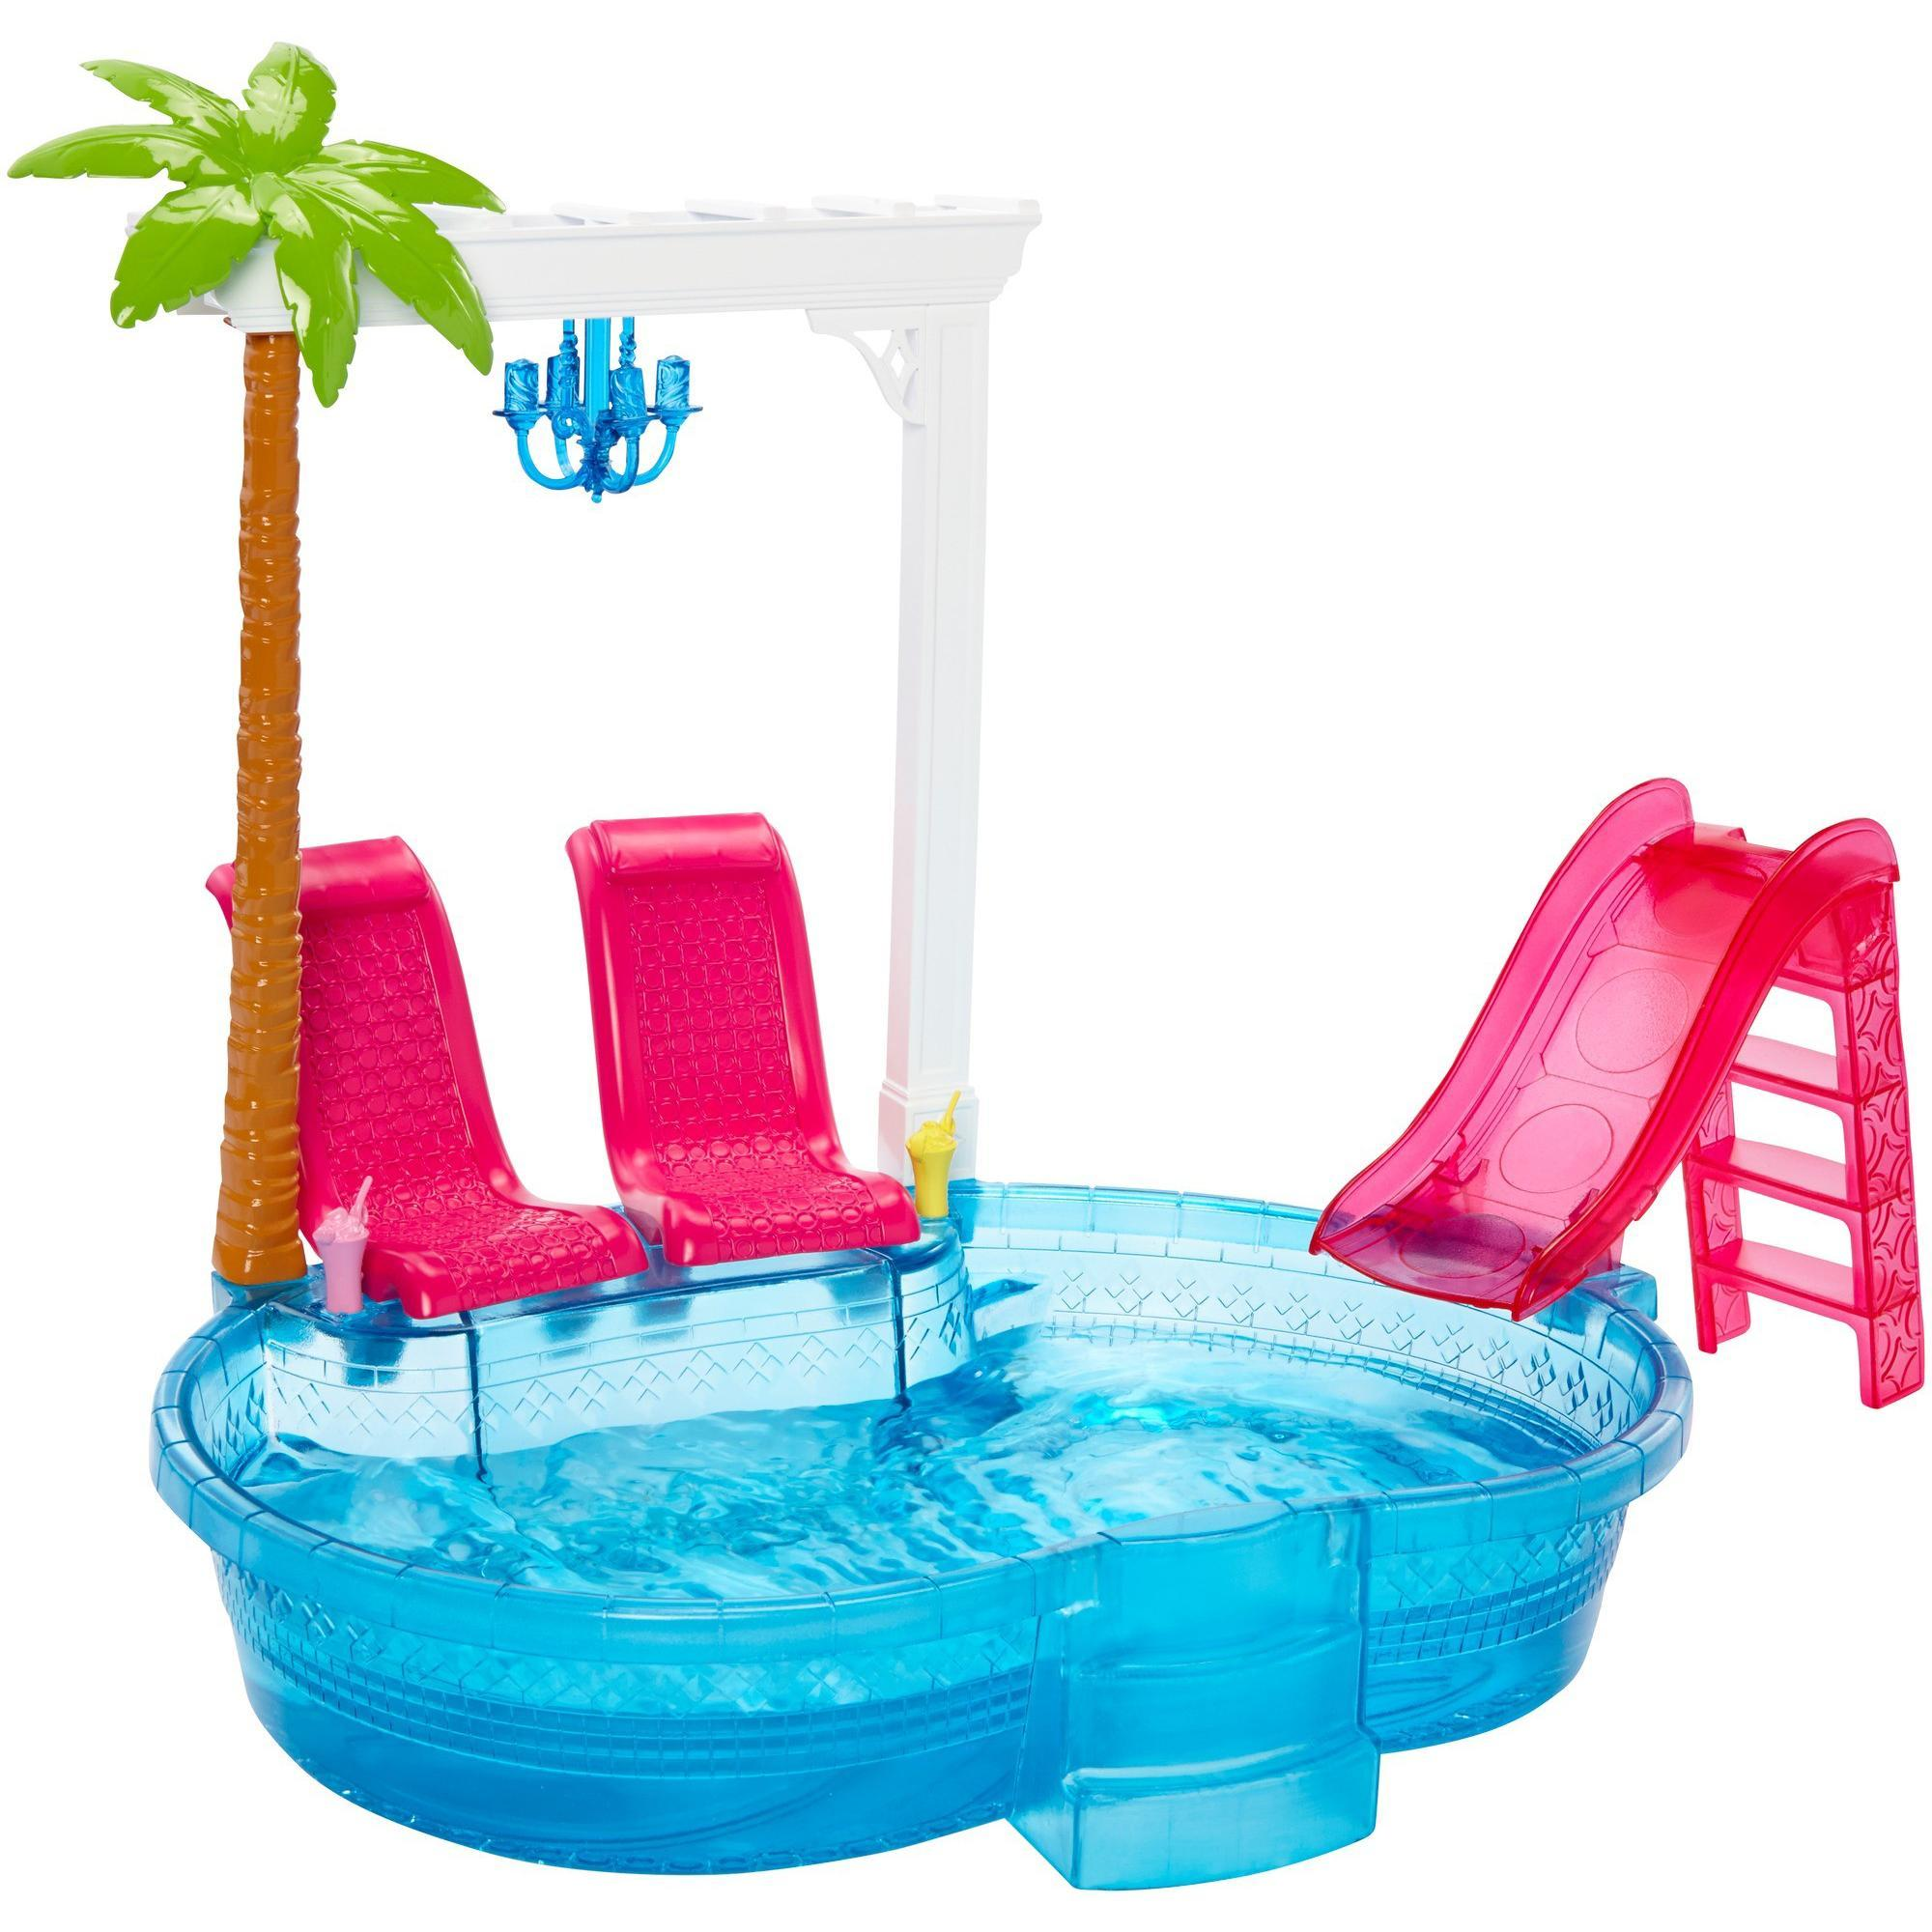 Barbie Glam Pool Party Playset